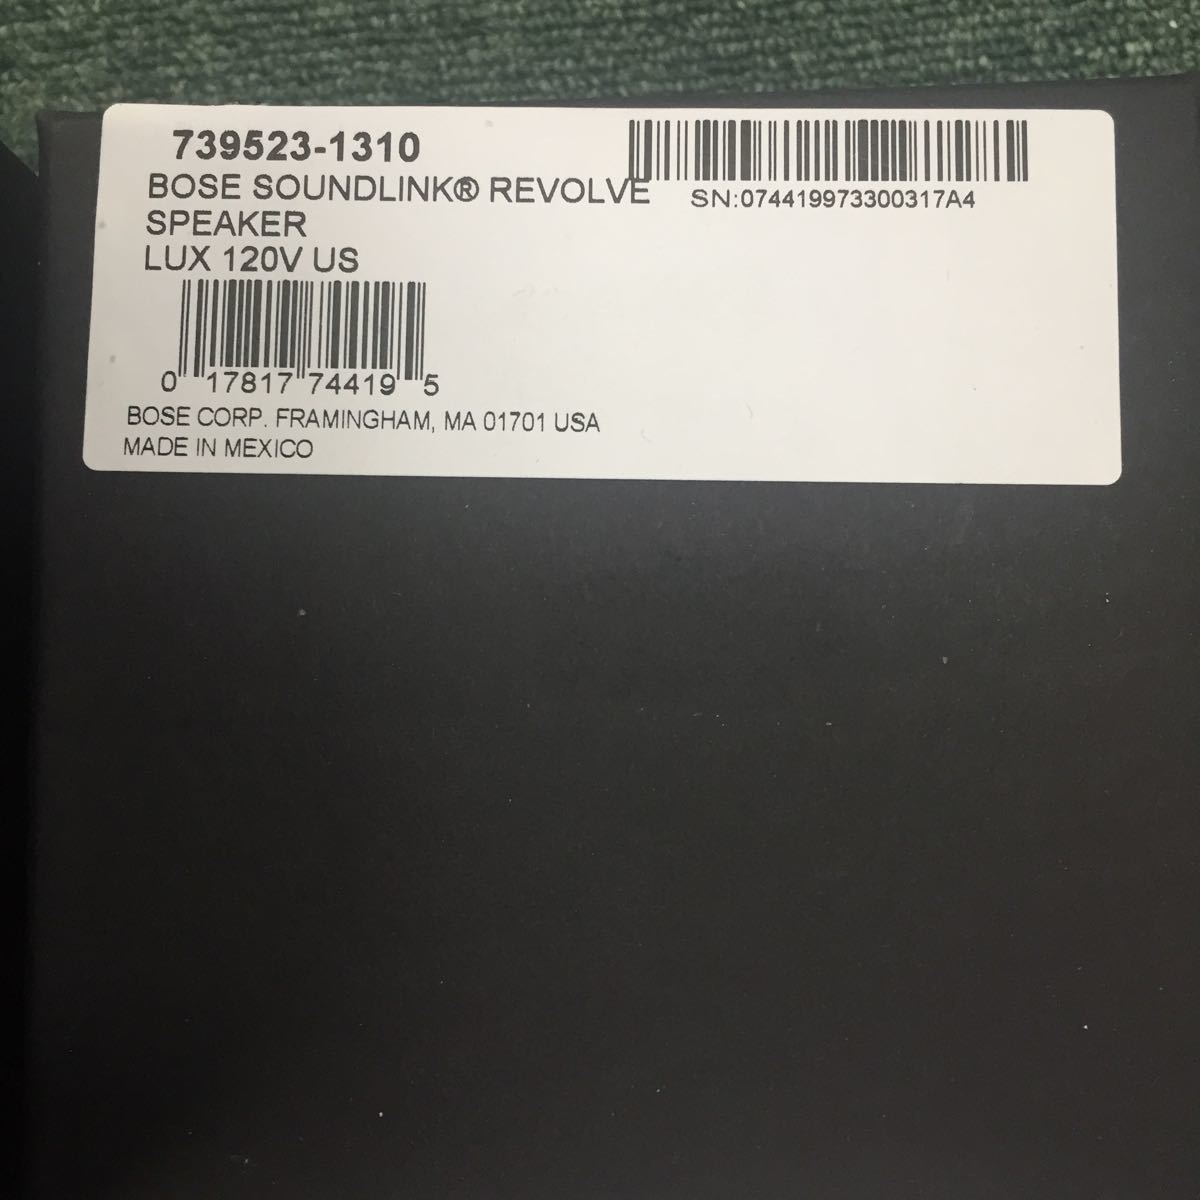 X416 BOSE スピーカー SOUNDLINK REVOLVE SPEAKR_画像5